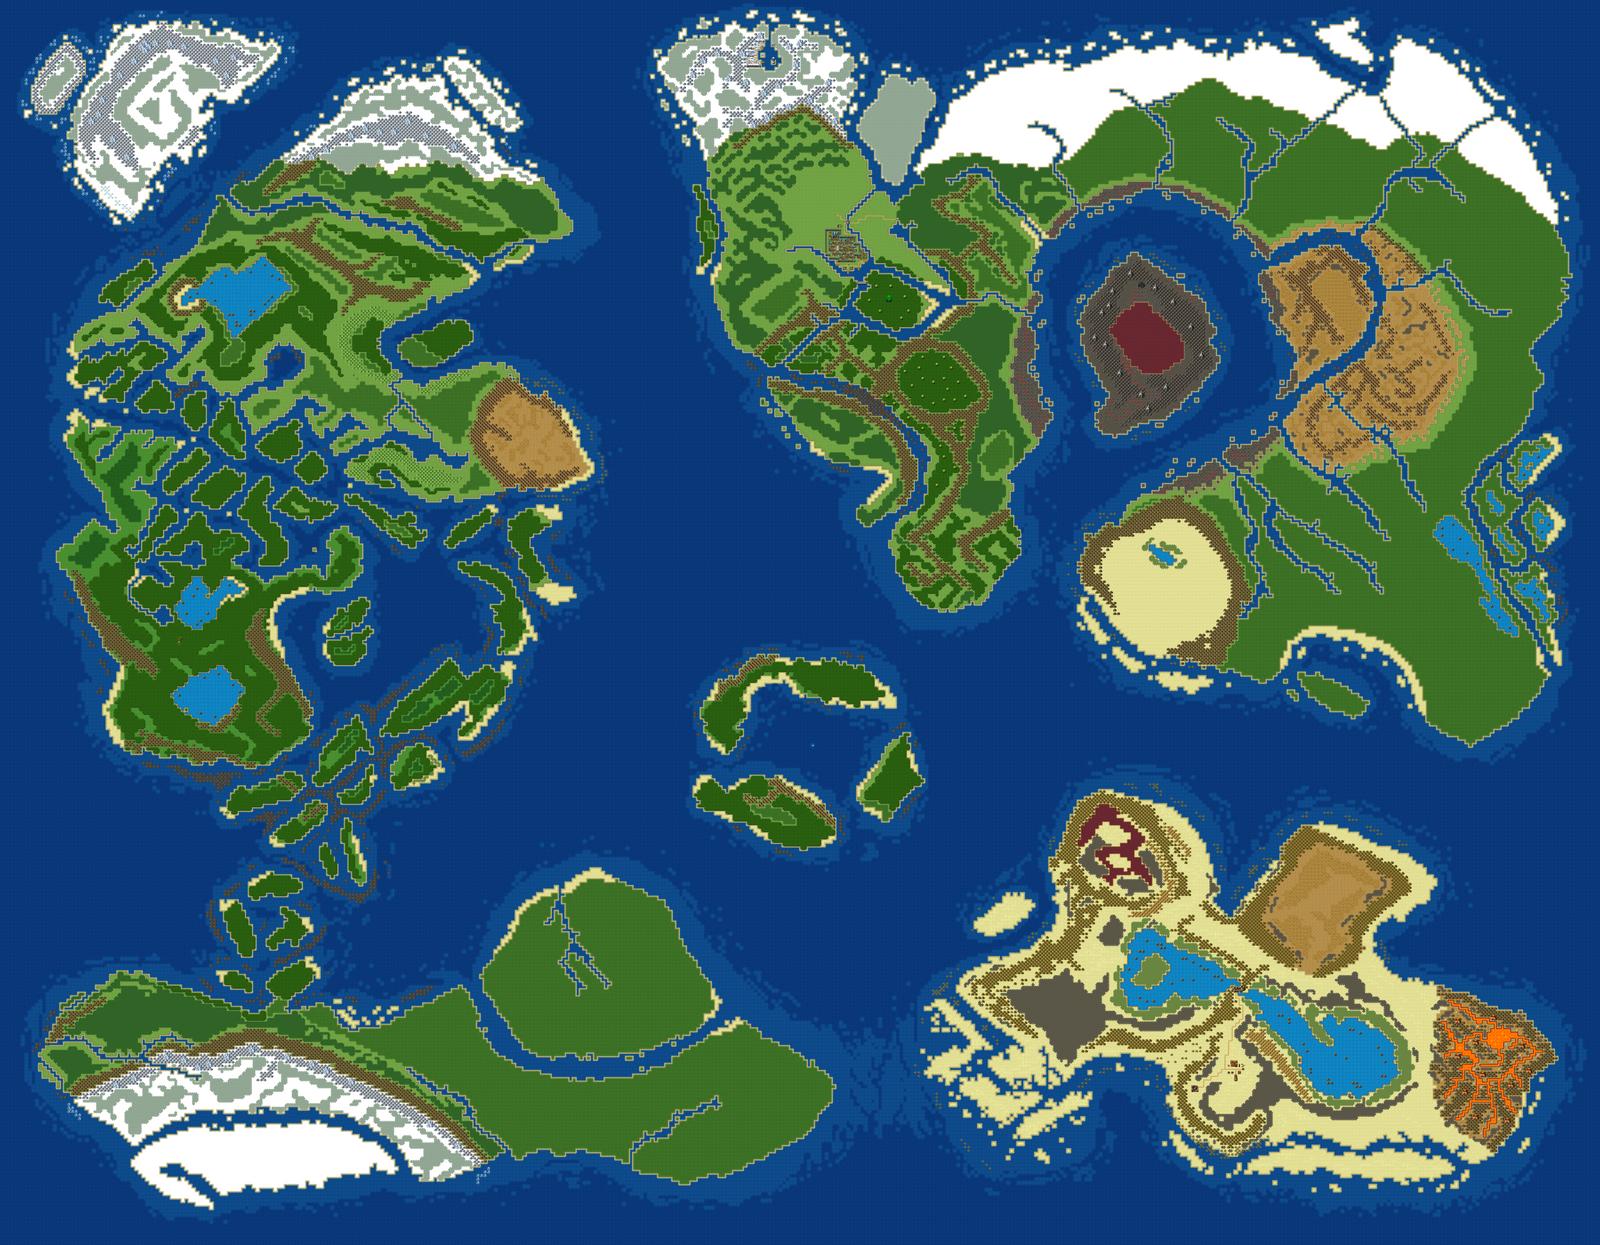 World map v4 by razzirazzi on deviantart world map v4 by razzirazzi world map v4 by razzirazzi gumiabroncs Image collections